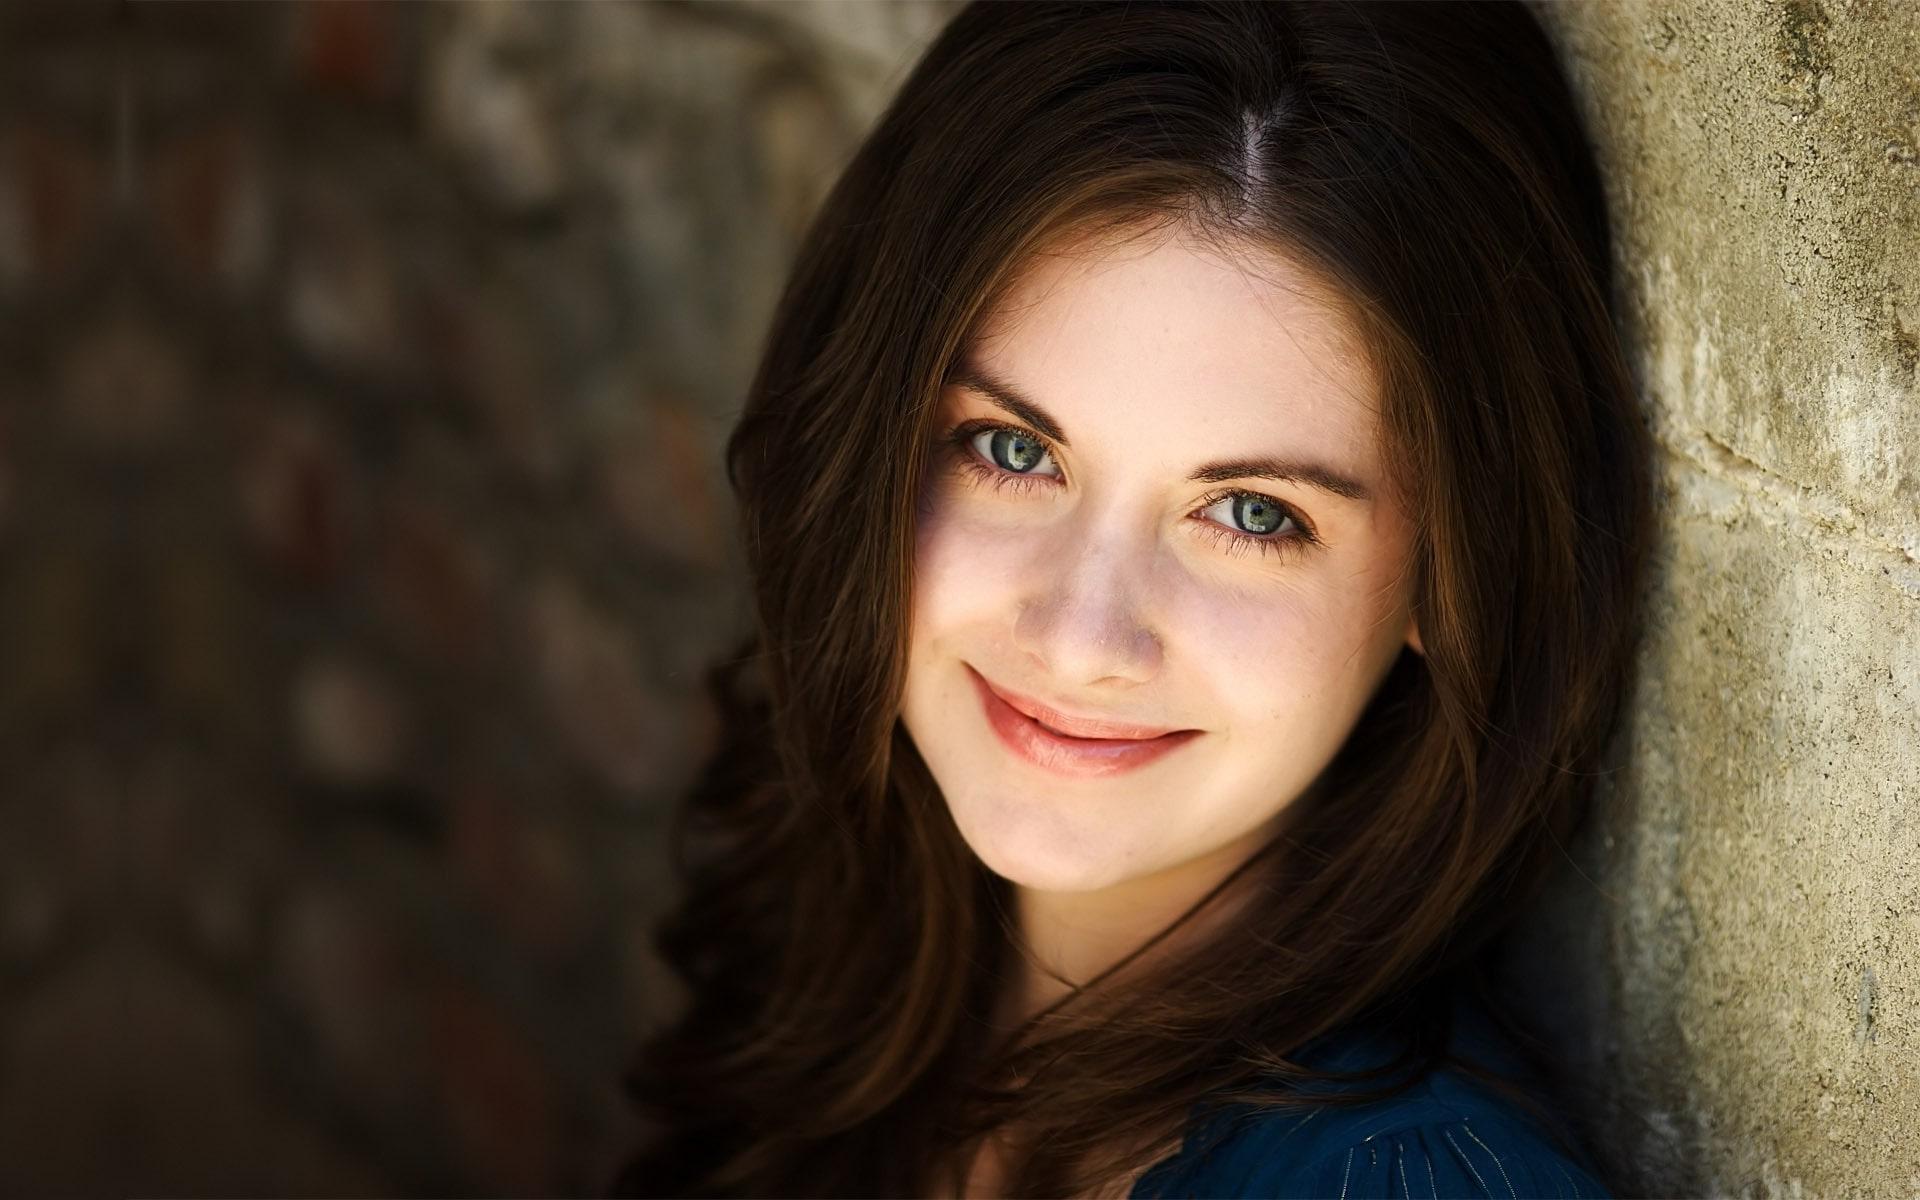 Alison Brie High